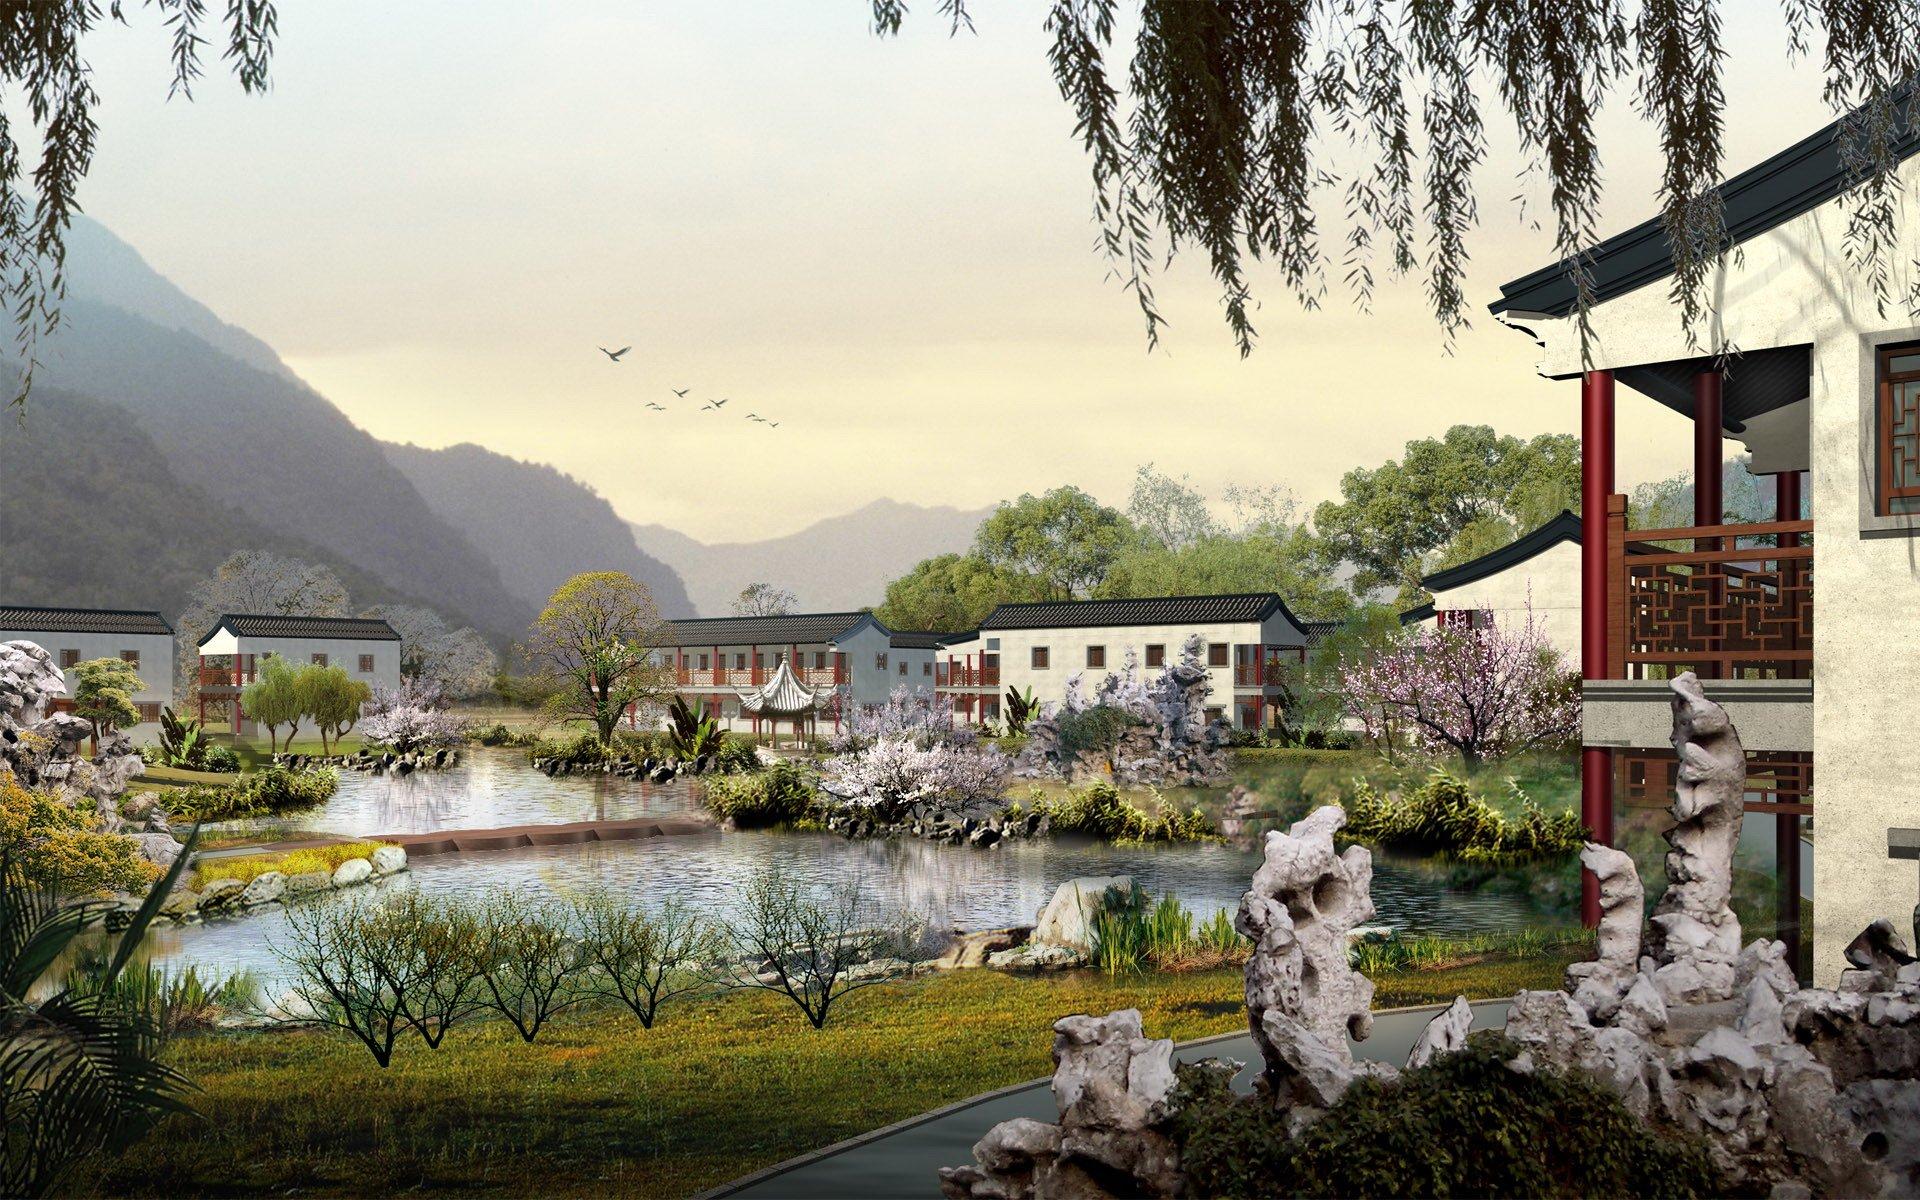 1024x640 chinese village wallpaper 1152x720 chinese village wallpaper 1920x1200